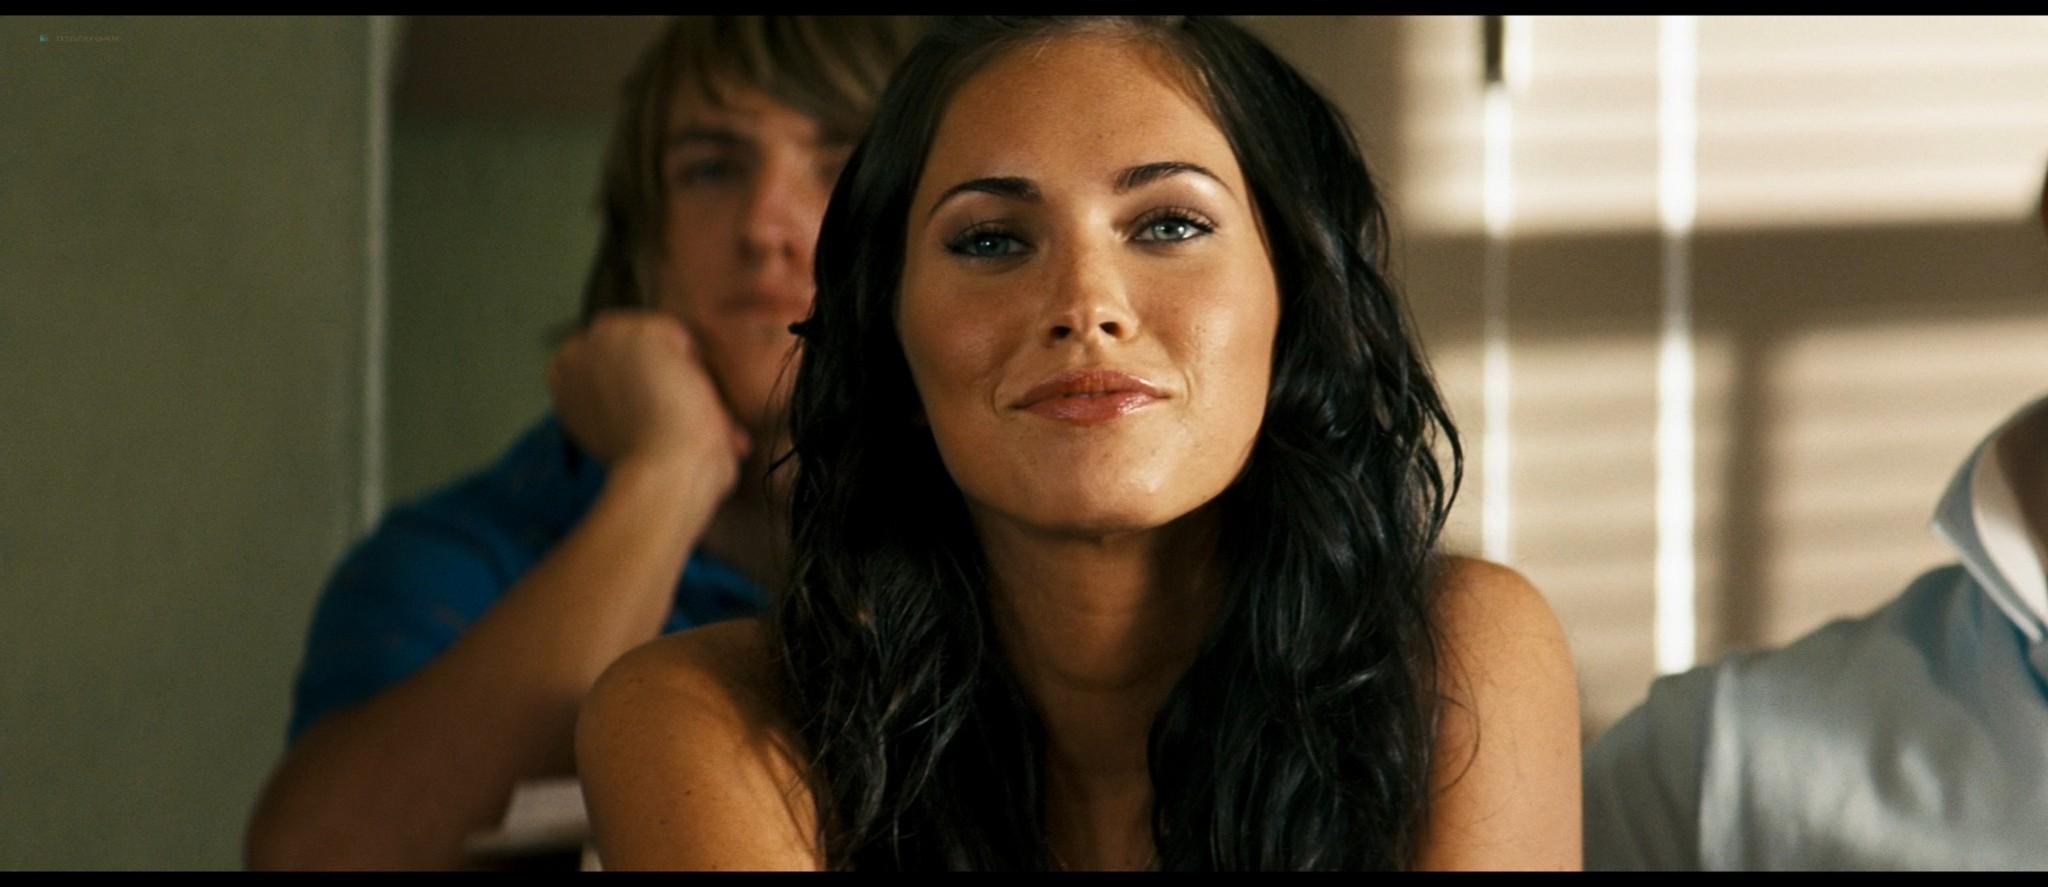 Megan Fox hot and sexy - Transformers (2007) HD 1080p BluRay Remux (20)